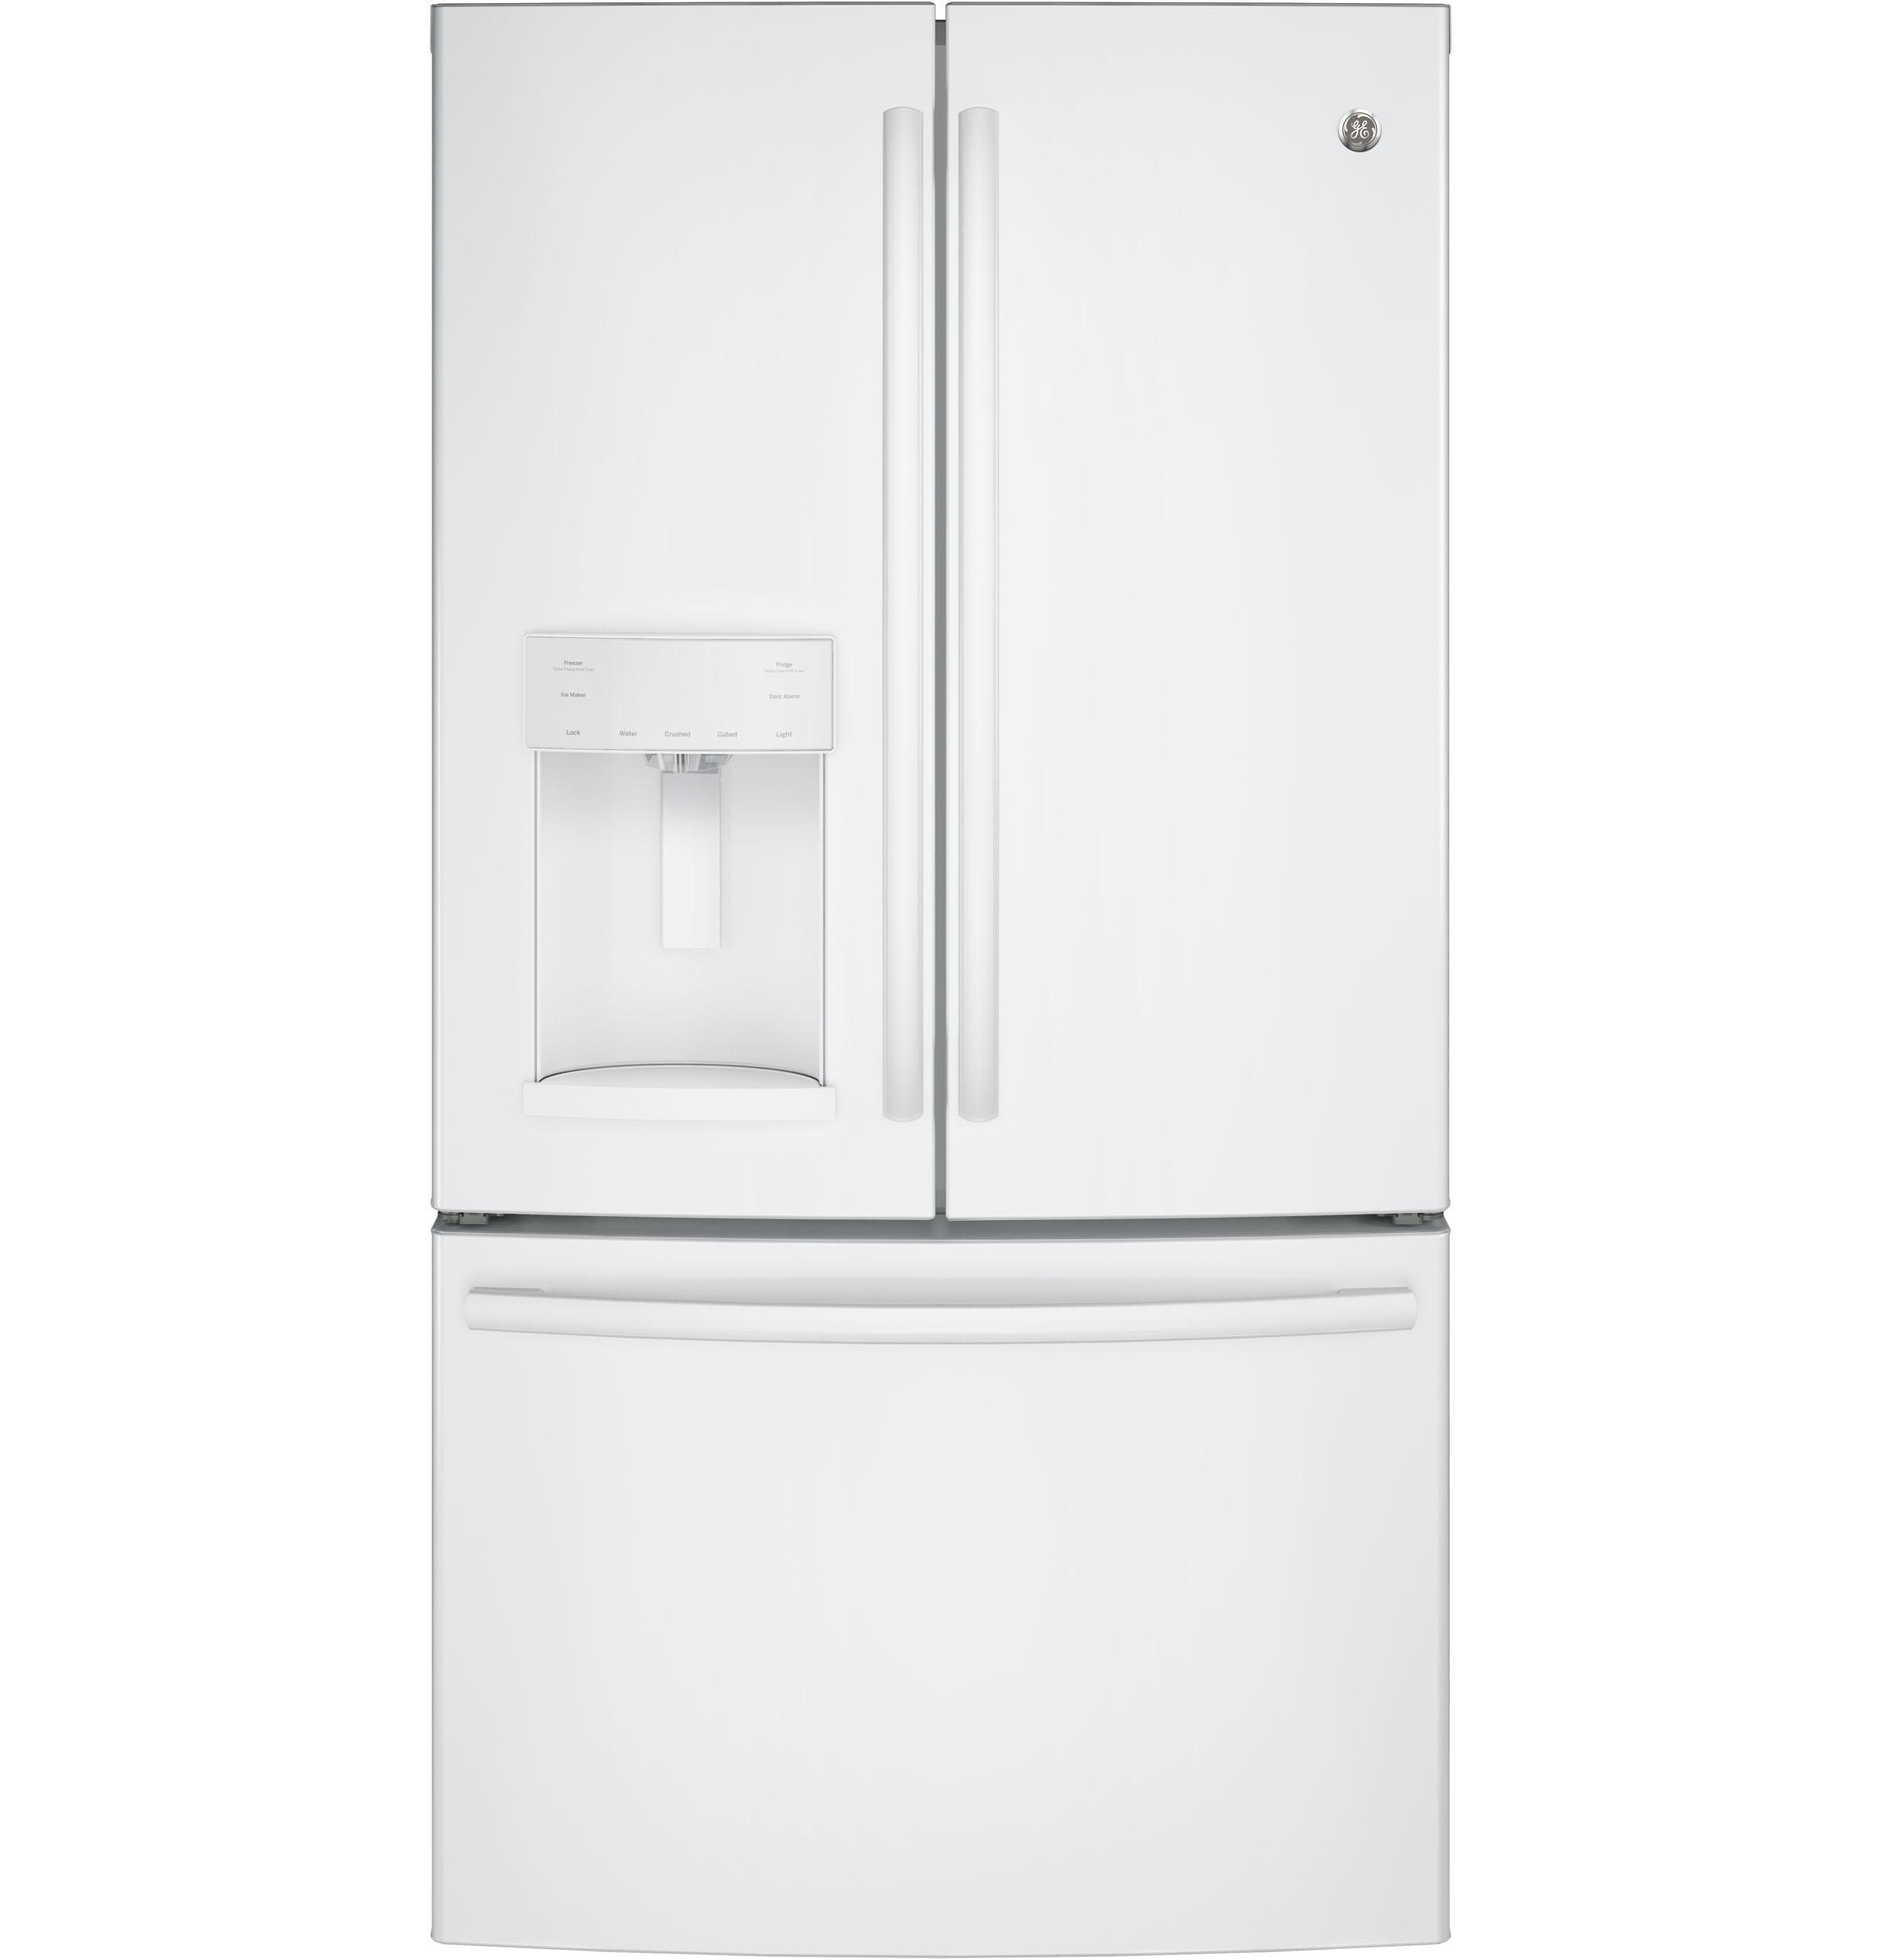 freezer door refrigerator refrigerators doors in french ready frcgmavgrpdq panel refrigeration zero built sub